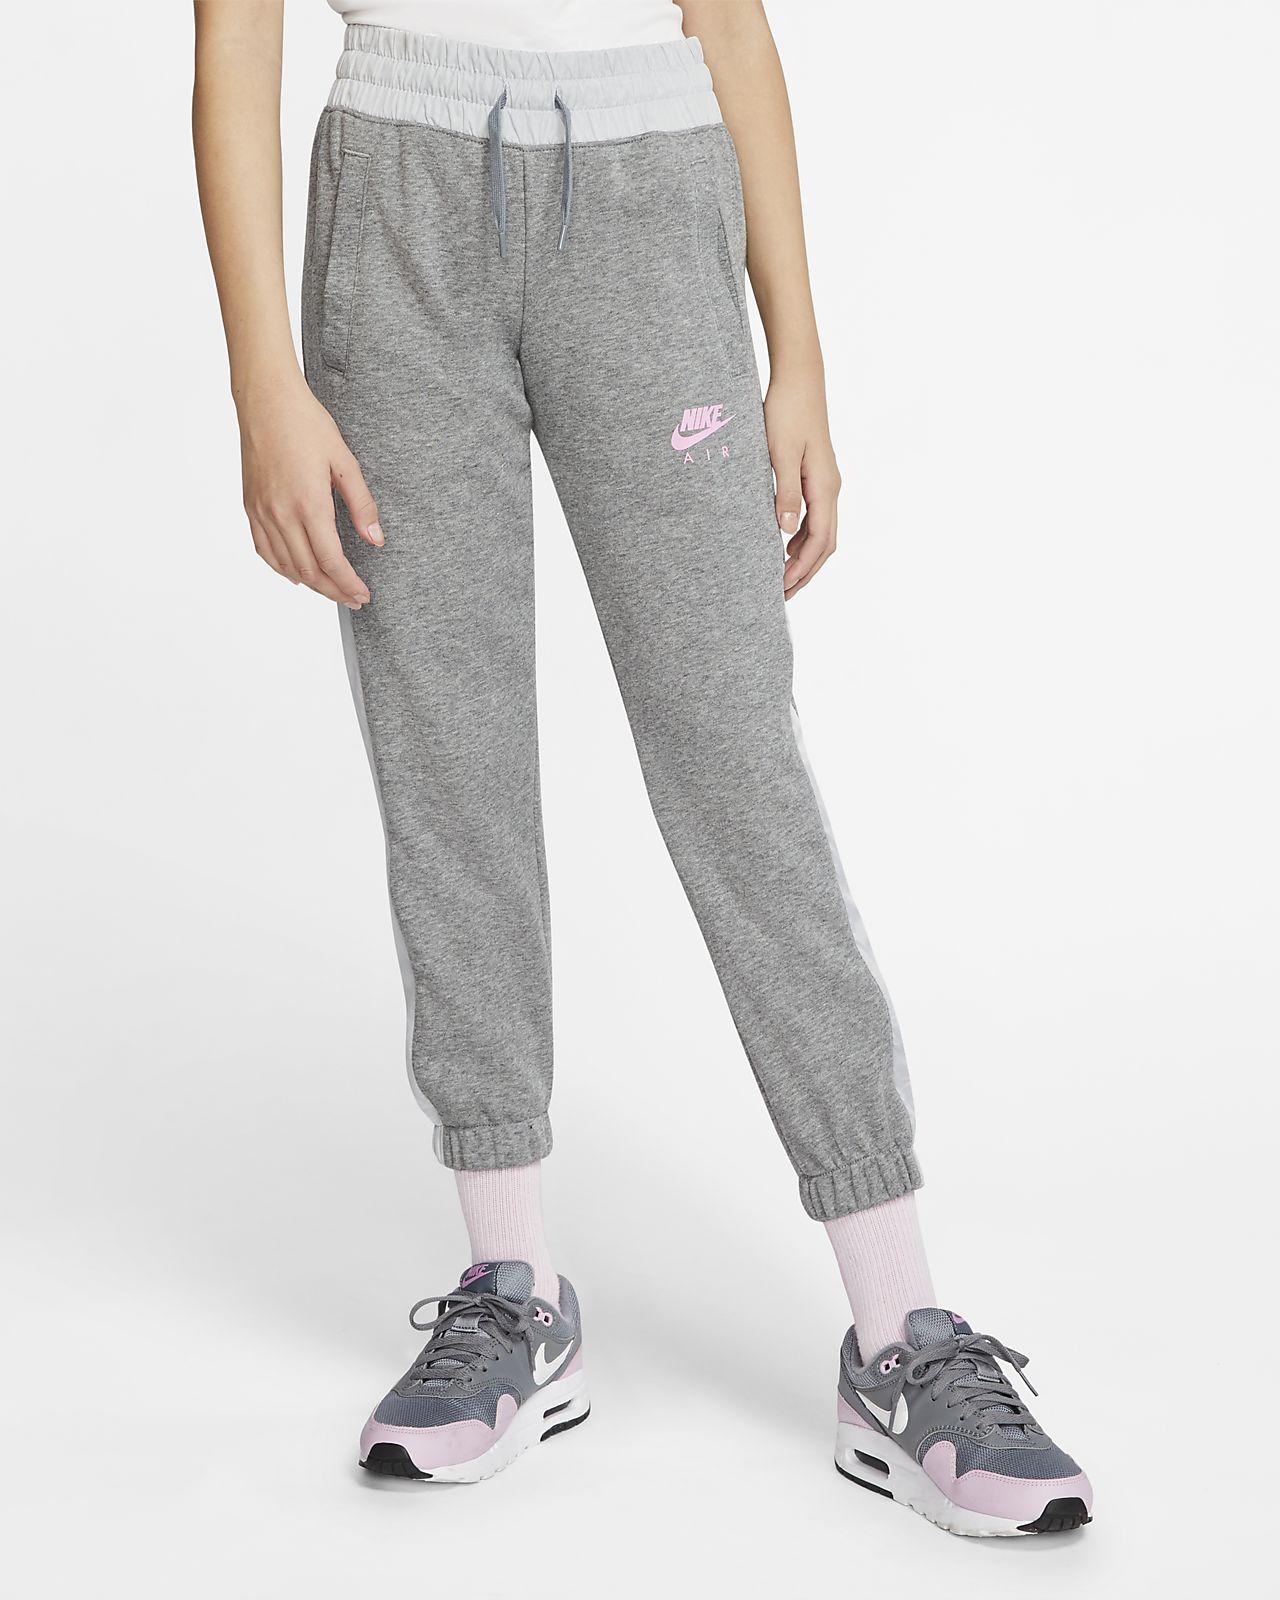 Pantaloni Nike Air - Ragazza